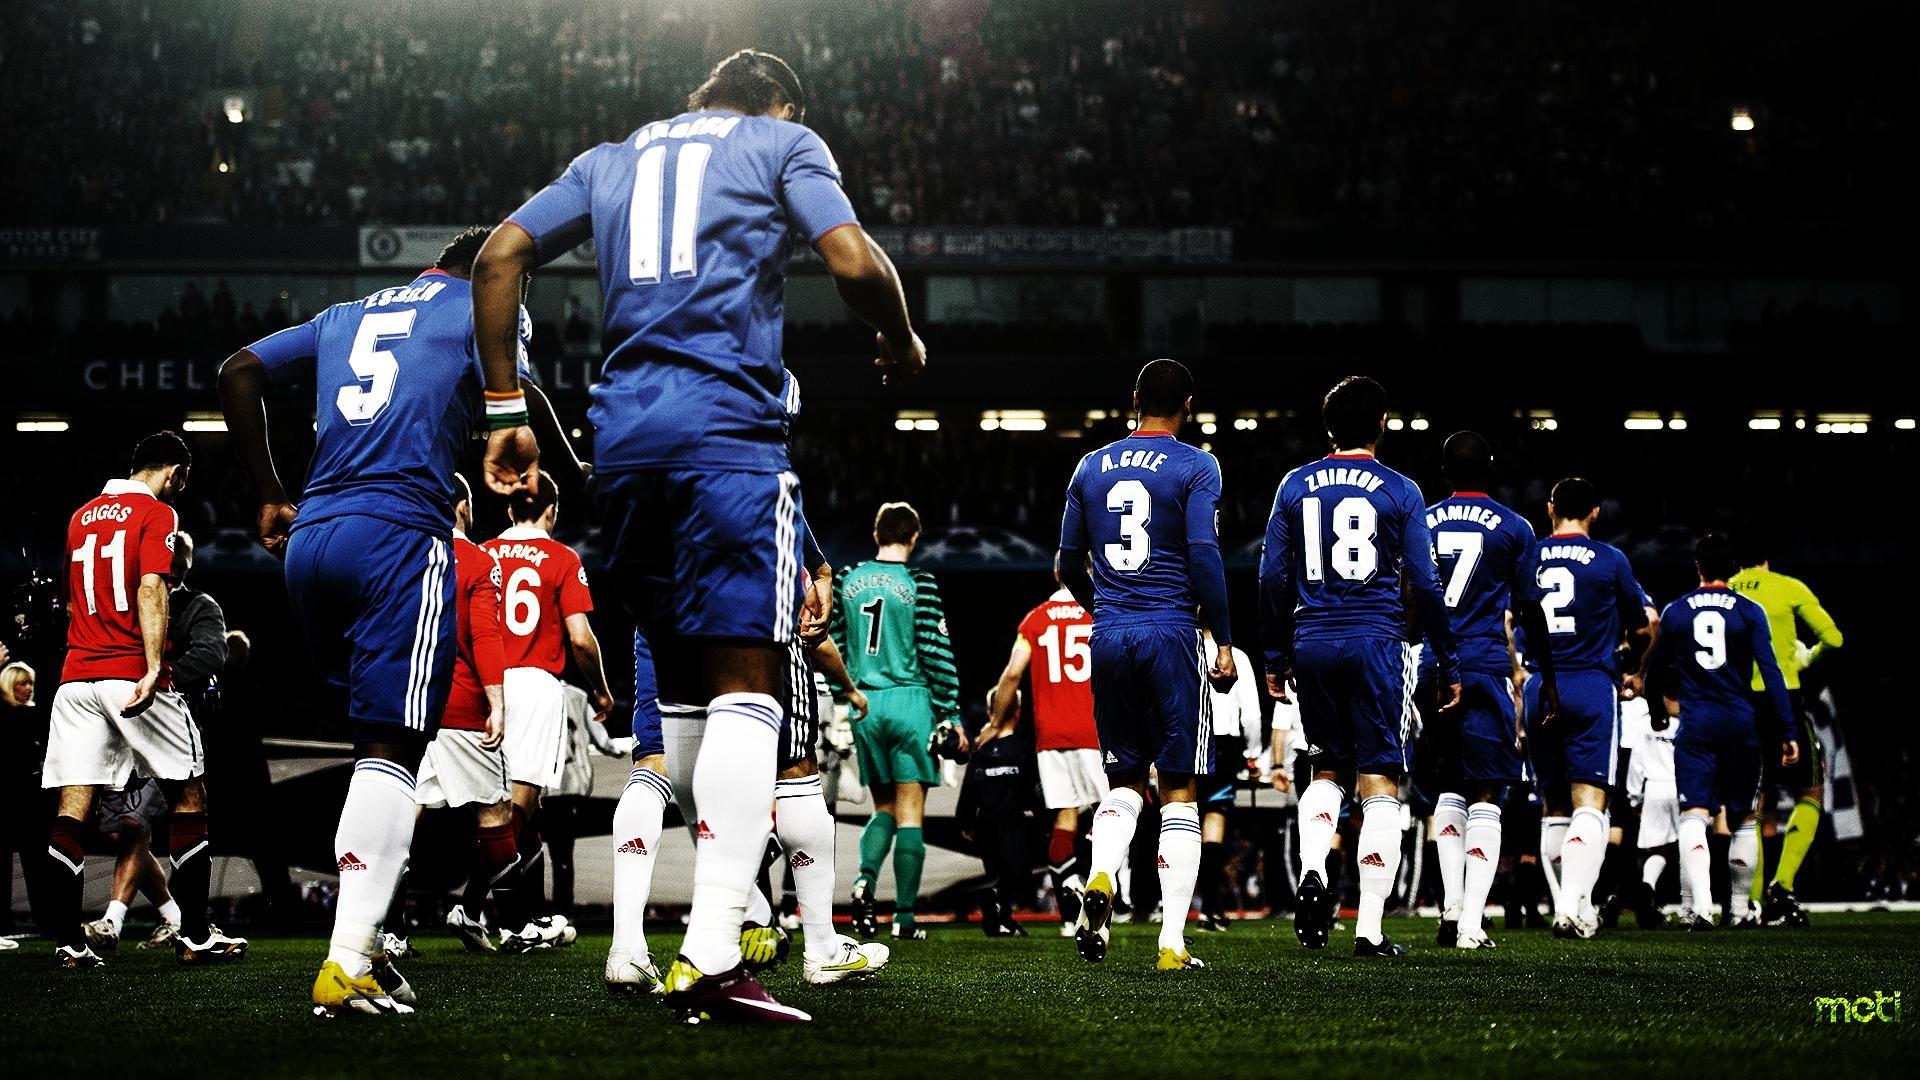 Chelsea Football Club Wallpapers ·① WallpaperTag